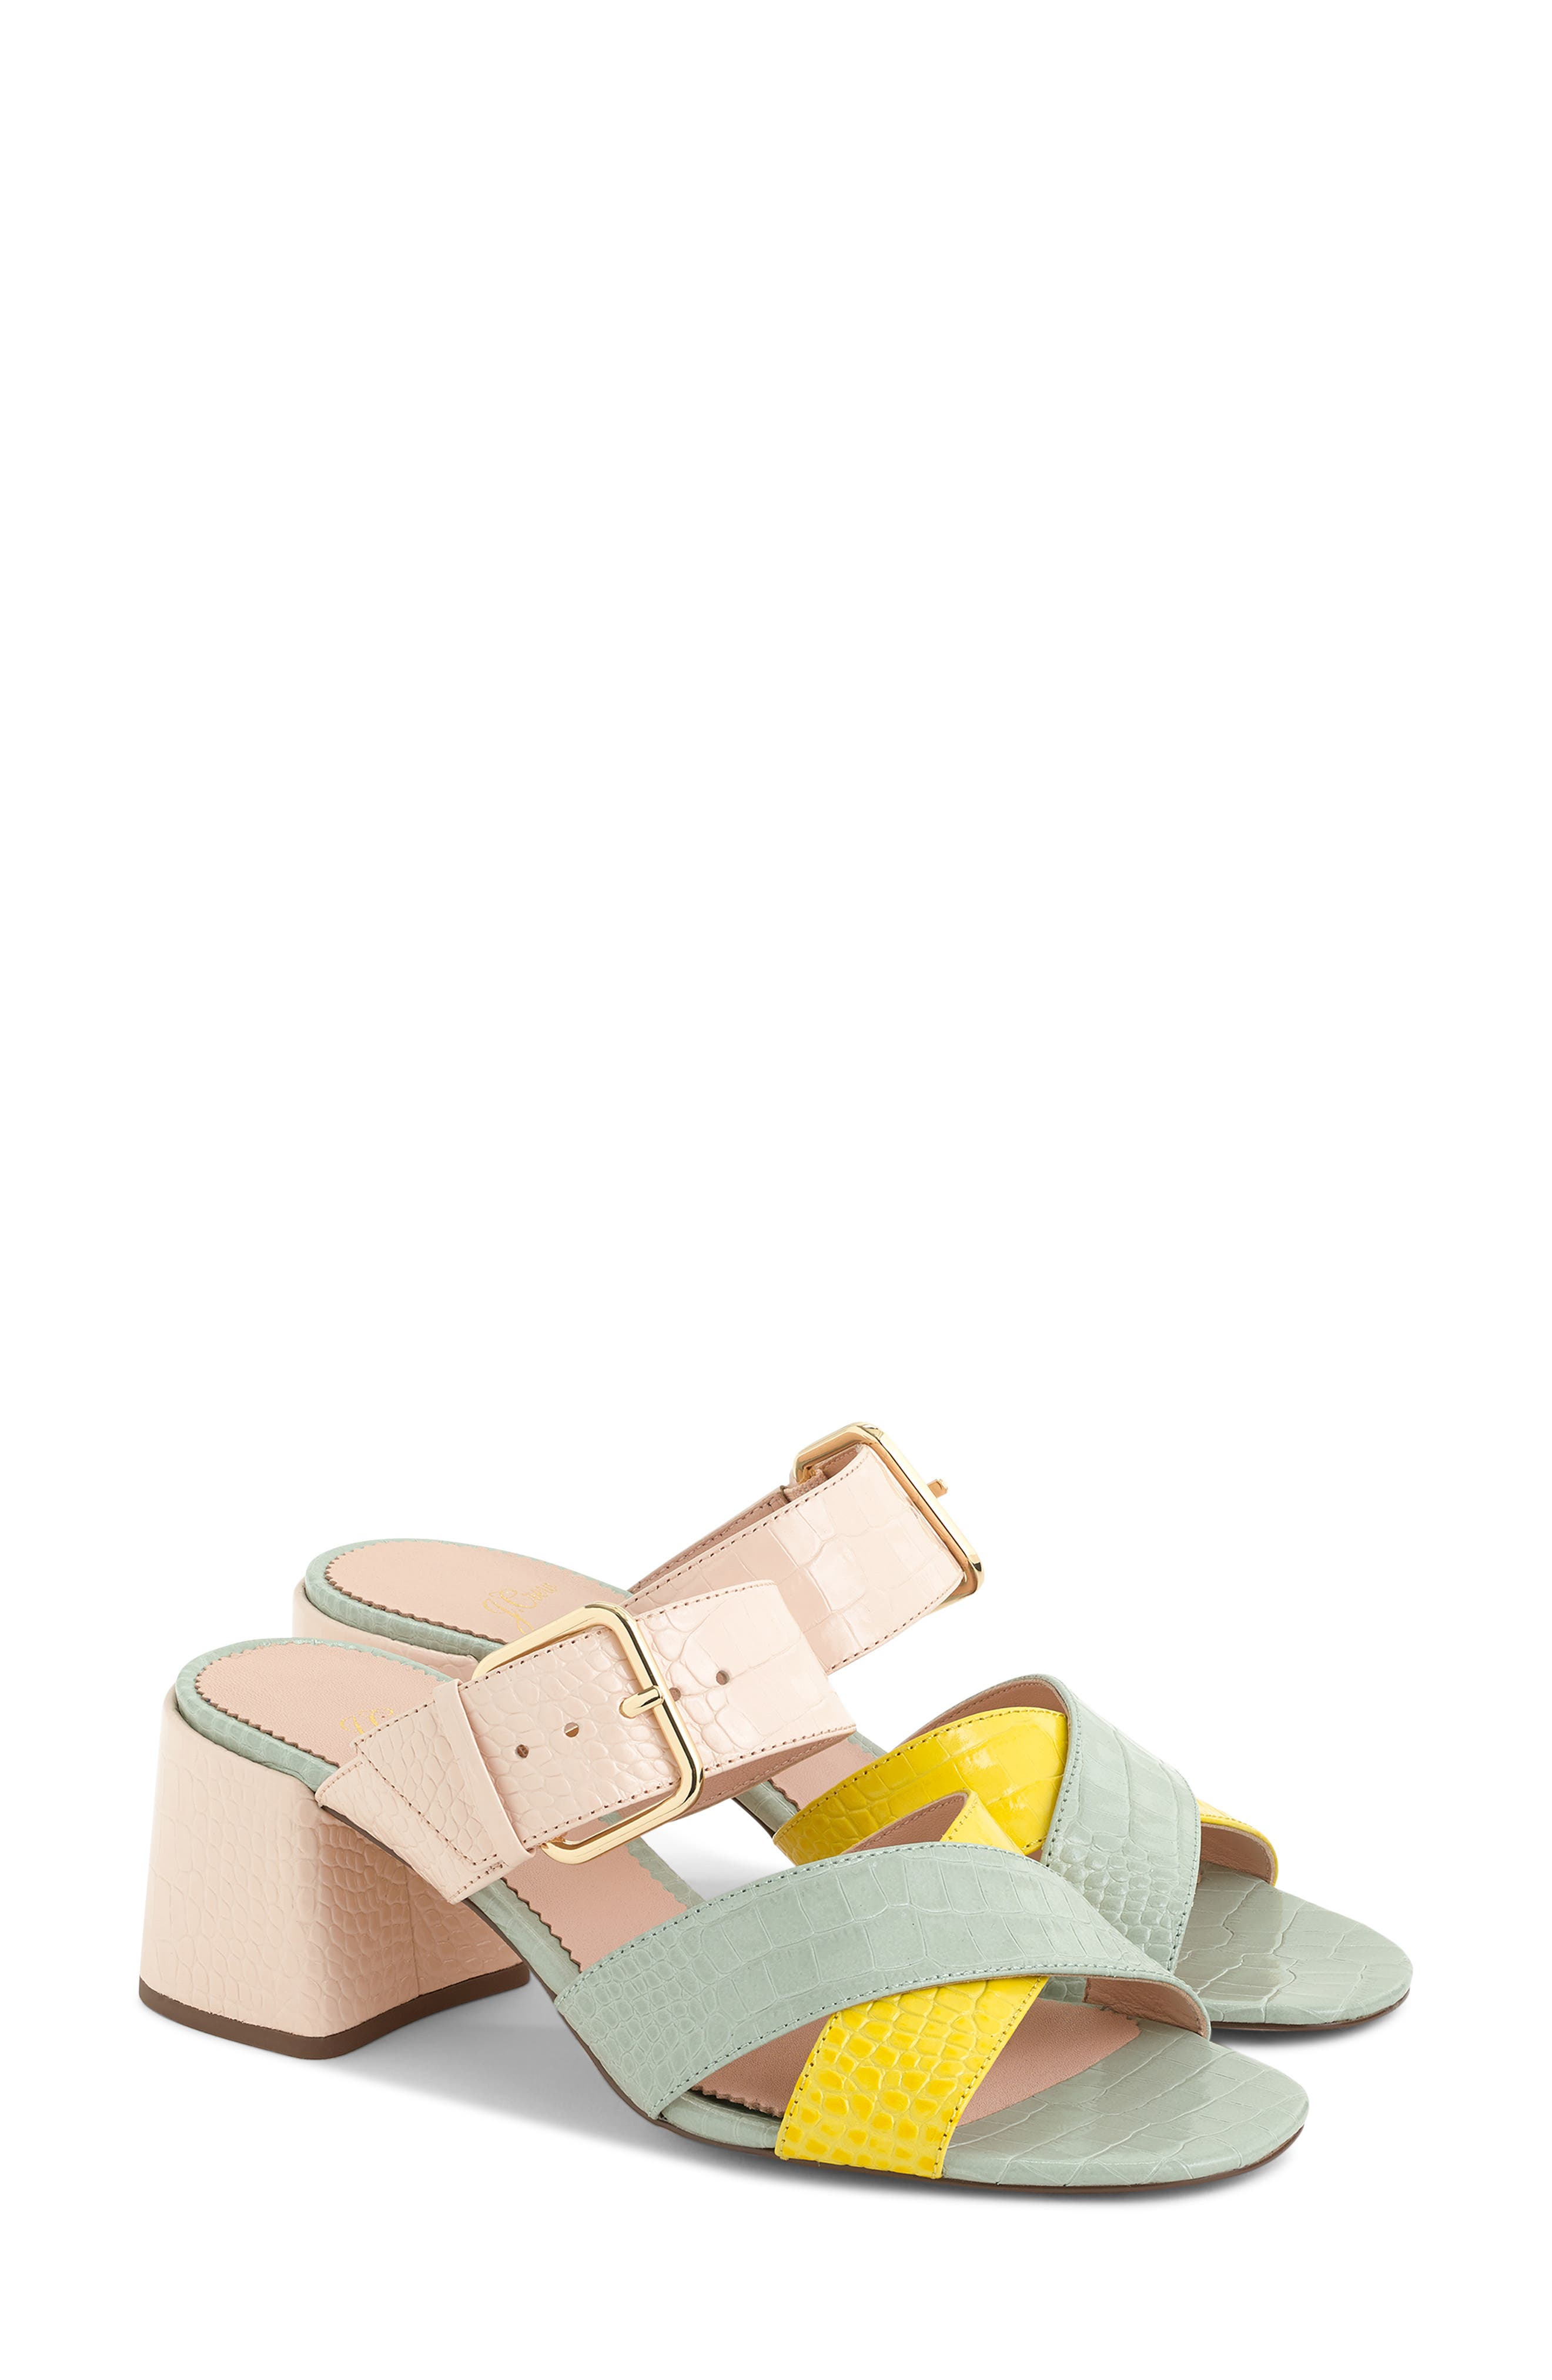 Penny Colorblock Faux Croc Slide Sandal, Main, color, BRIGHT YOLK SUEDE